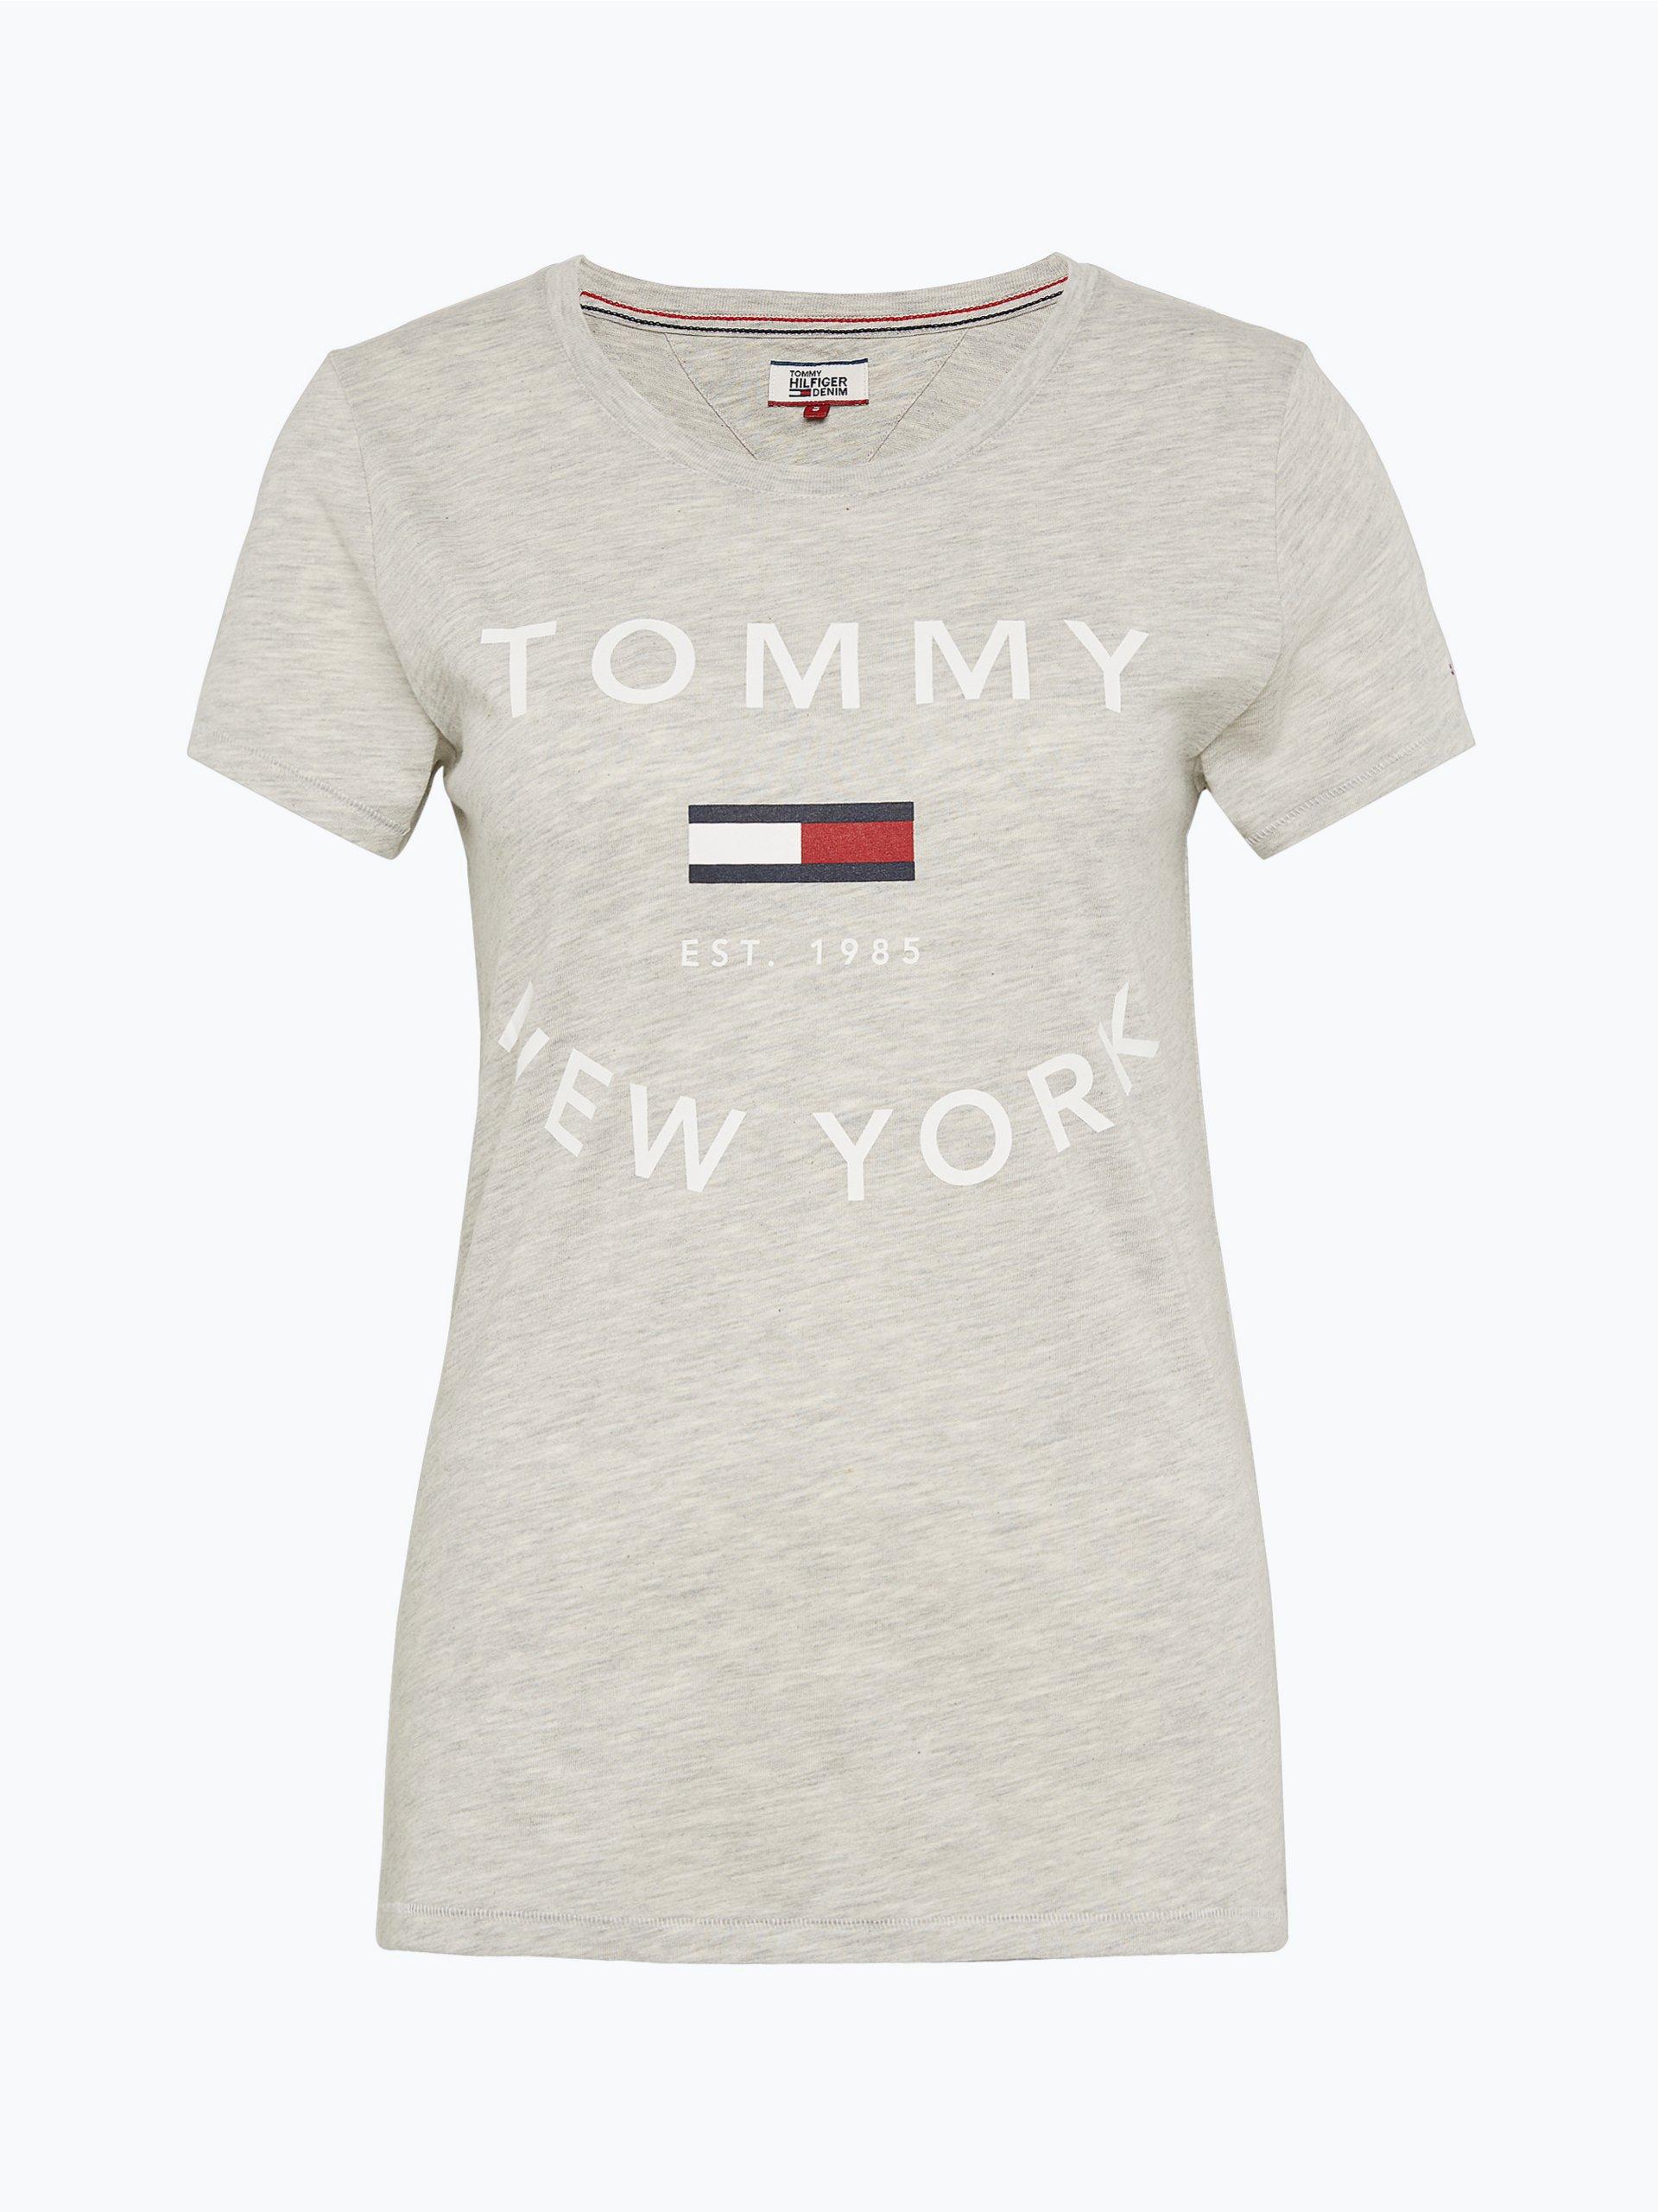 tommy jeans damen t shirt grau uni online kaufen peek. Black Bedroom Furniture Sets. Home Design Ideas